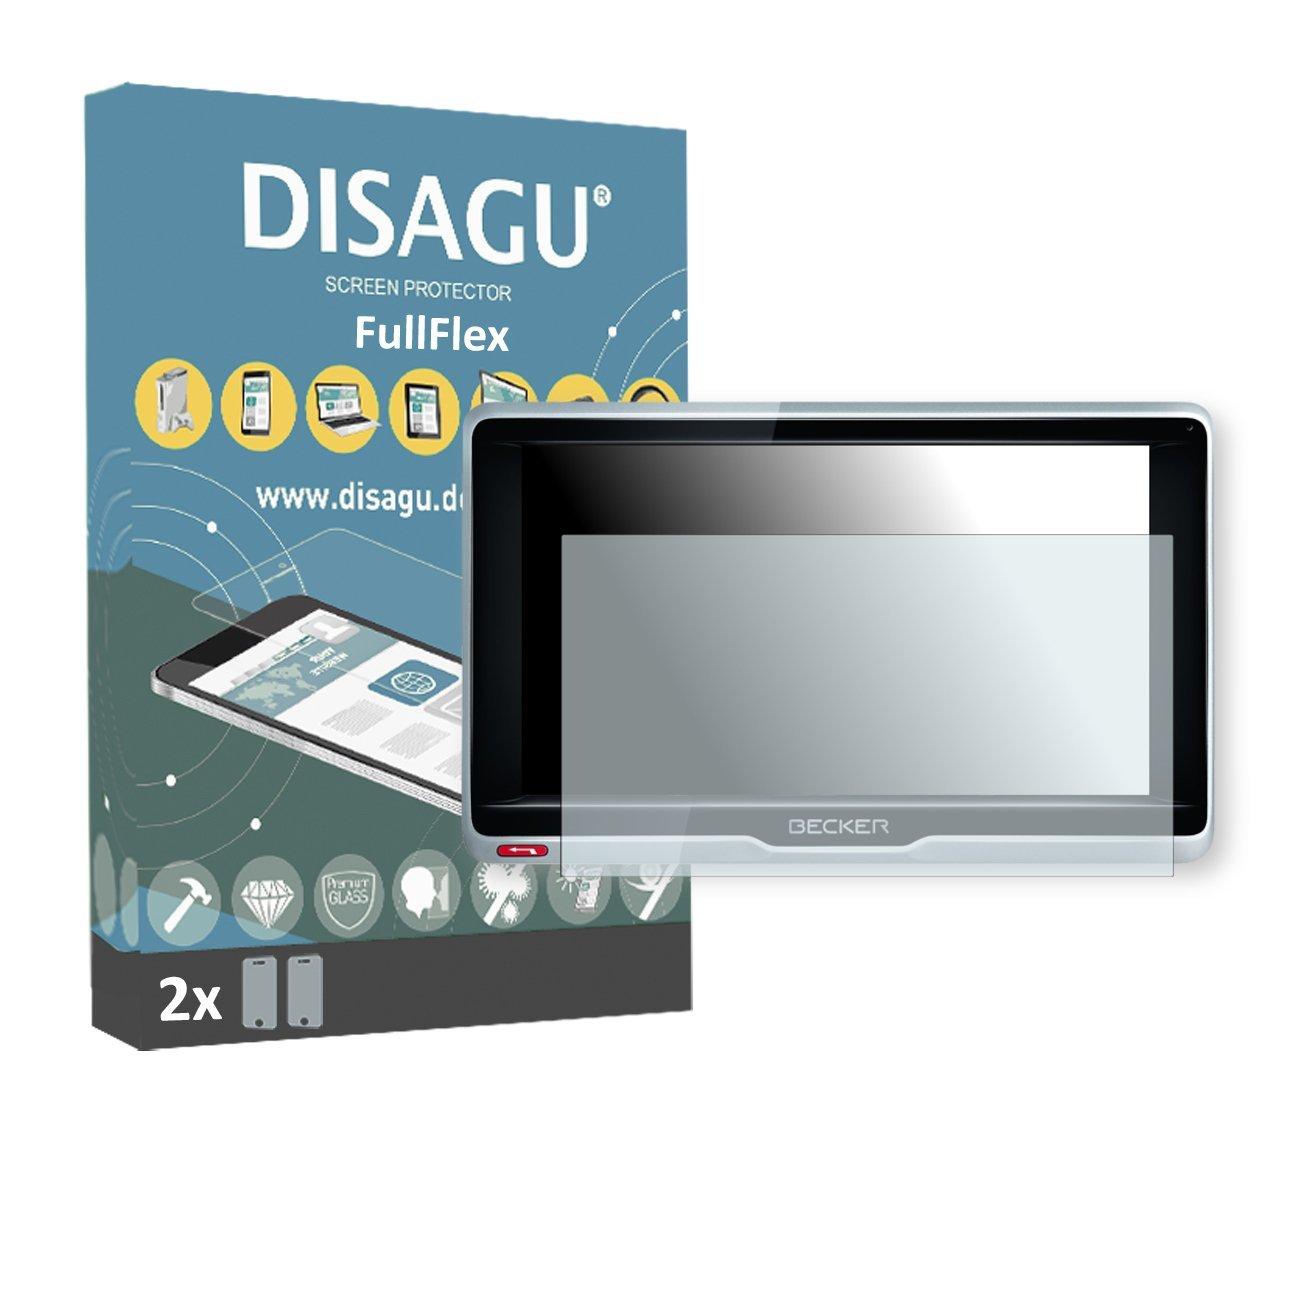 2 x Disagu FullFlex screen protector for Becker transit.6 LMU foil screen protector